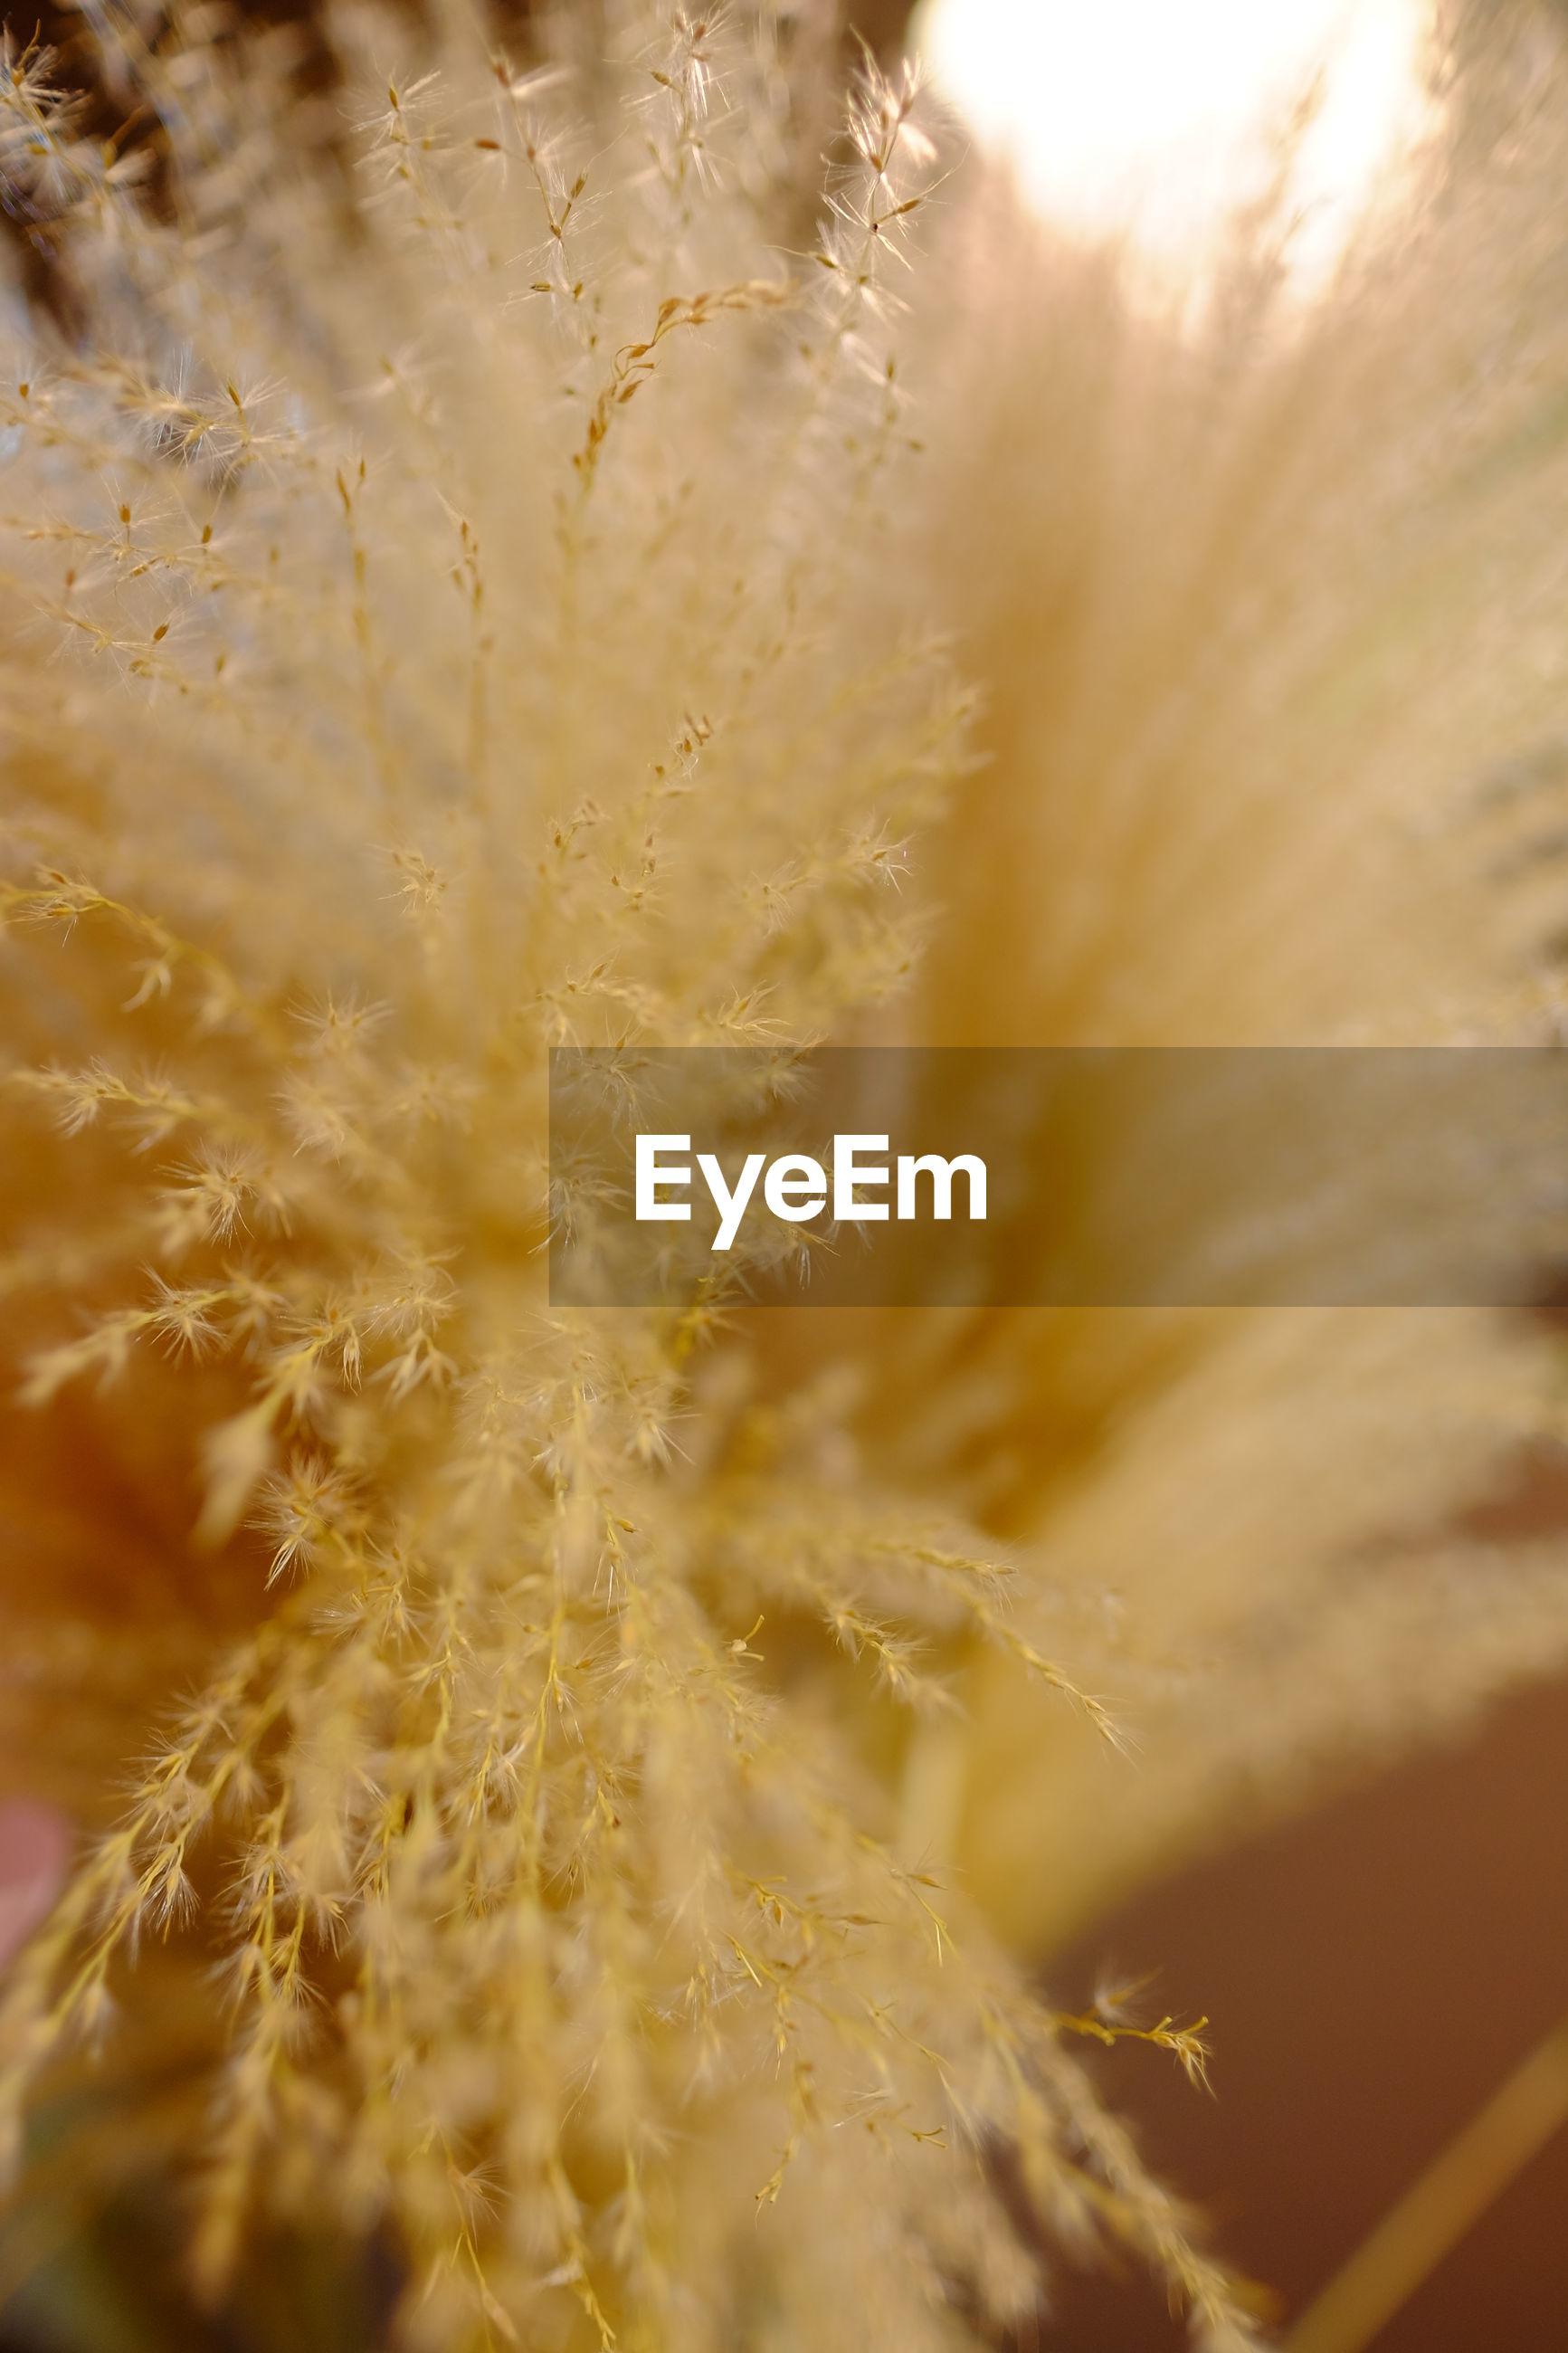 MACRO SHOT OF YELLOW FLOWERING PLANTS